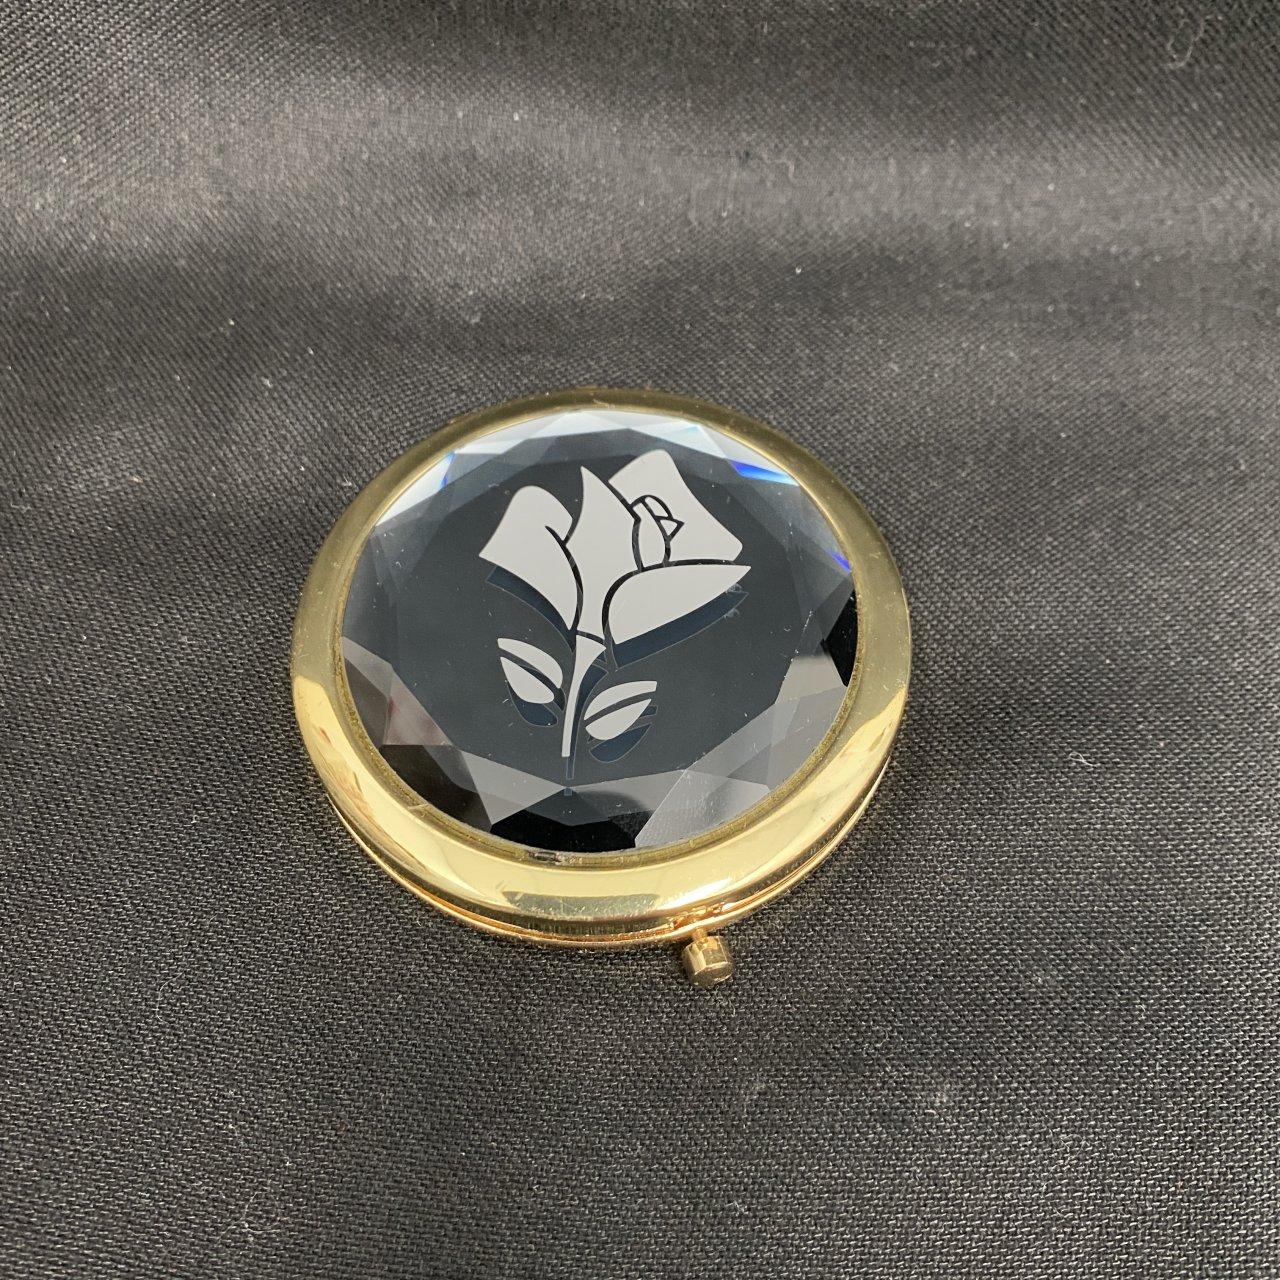 Lancôme Diamond Compact Mirror + Lip Gloss &Hand Cream Set